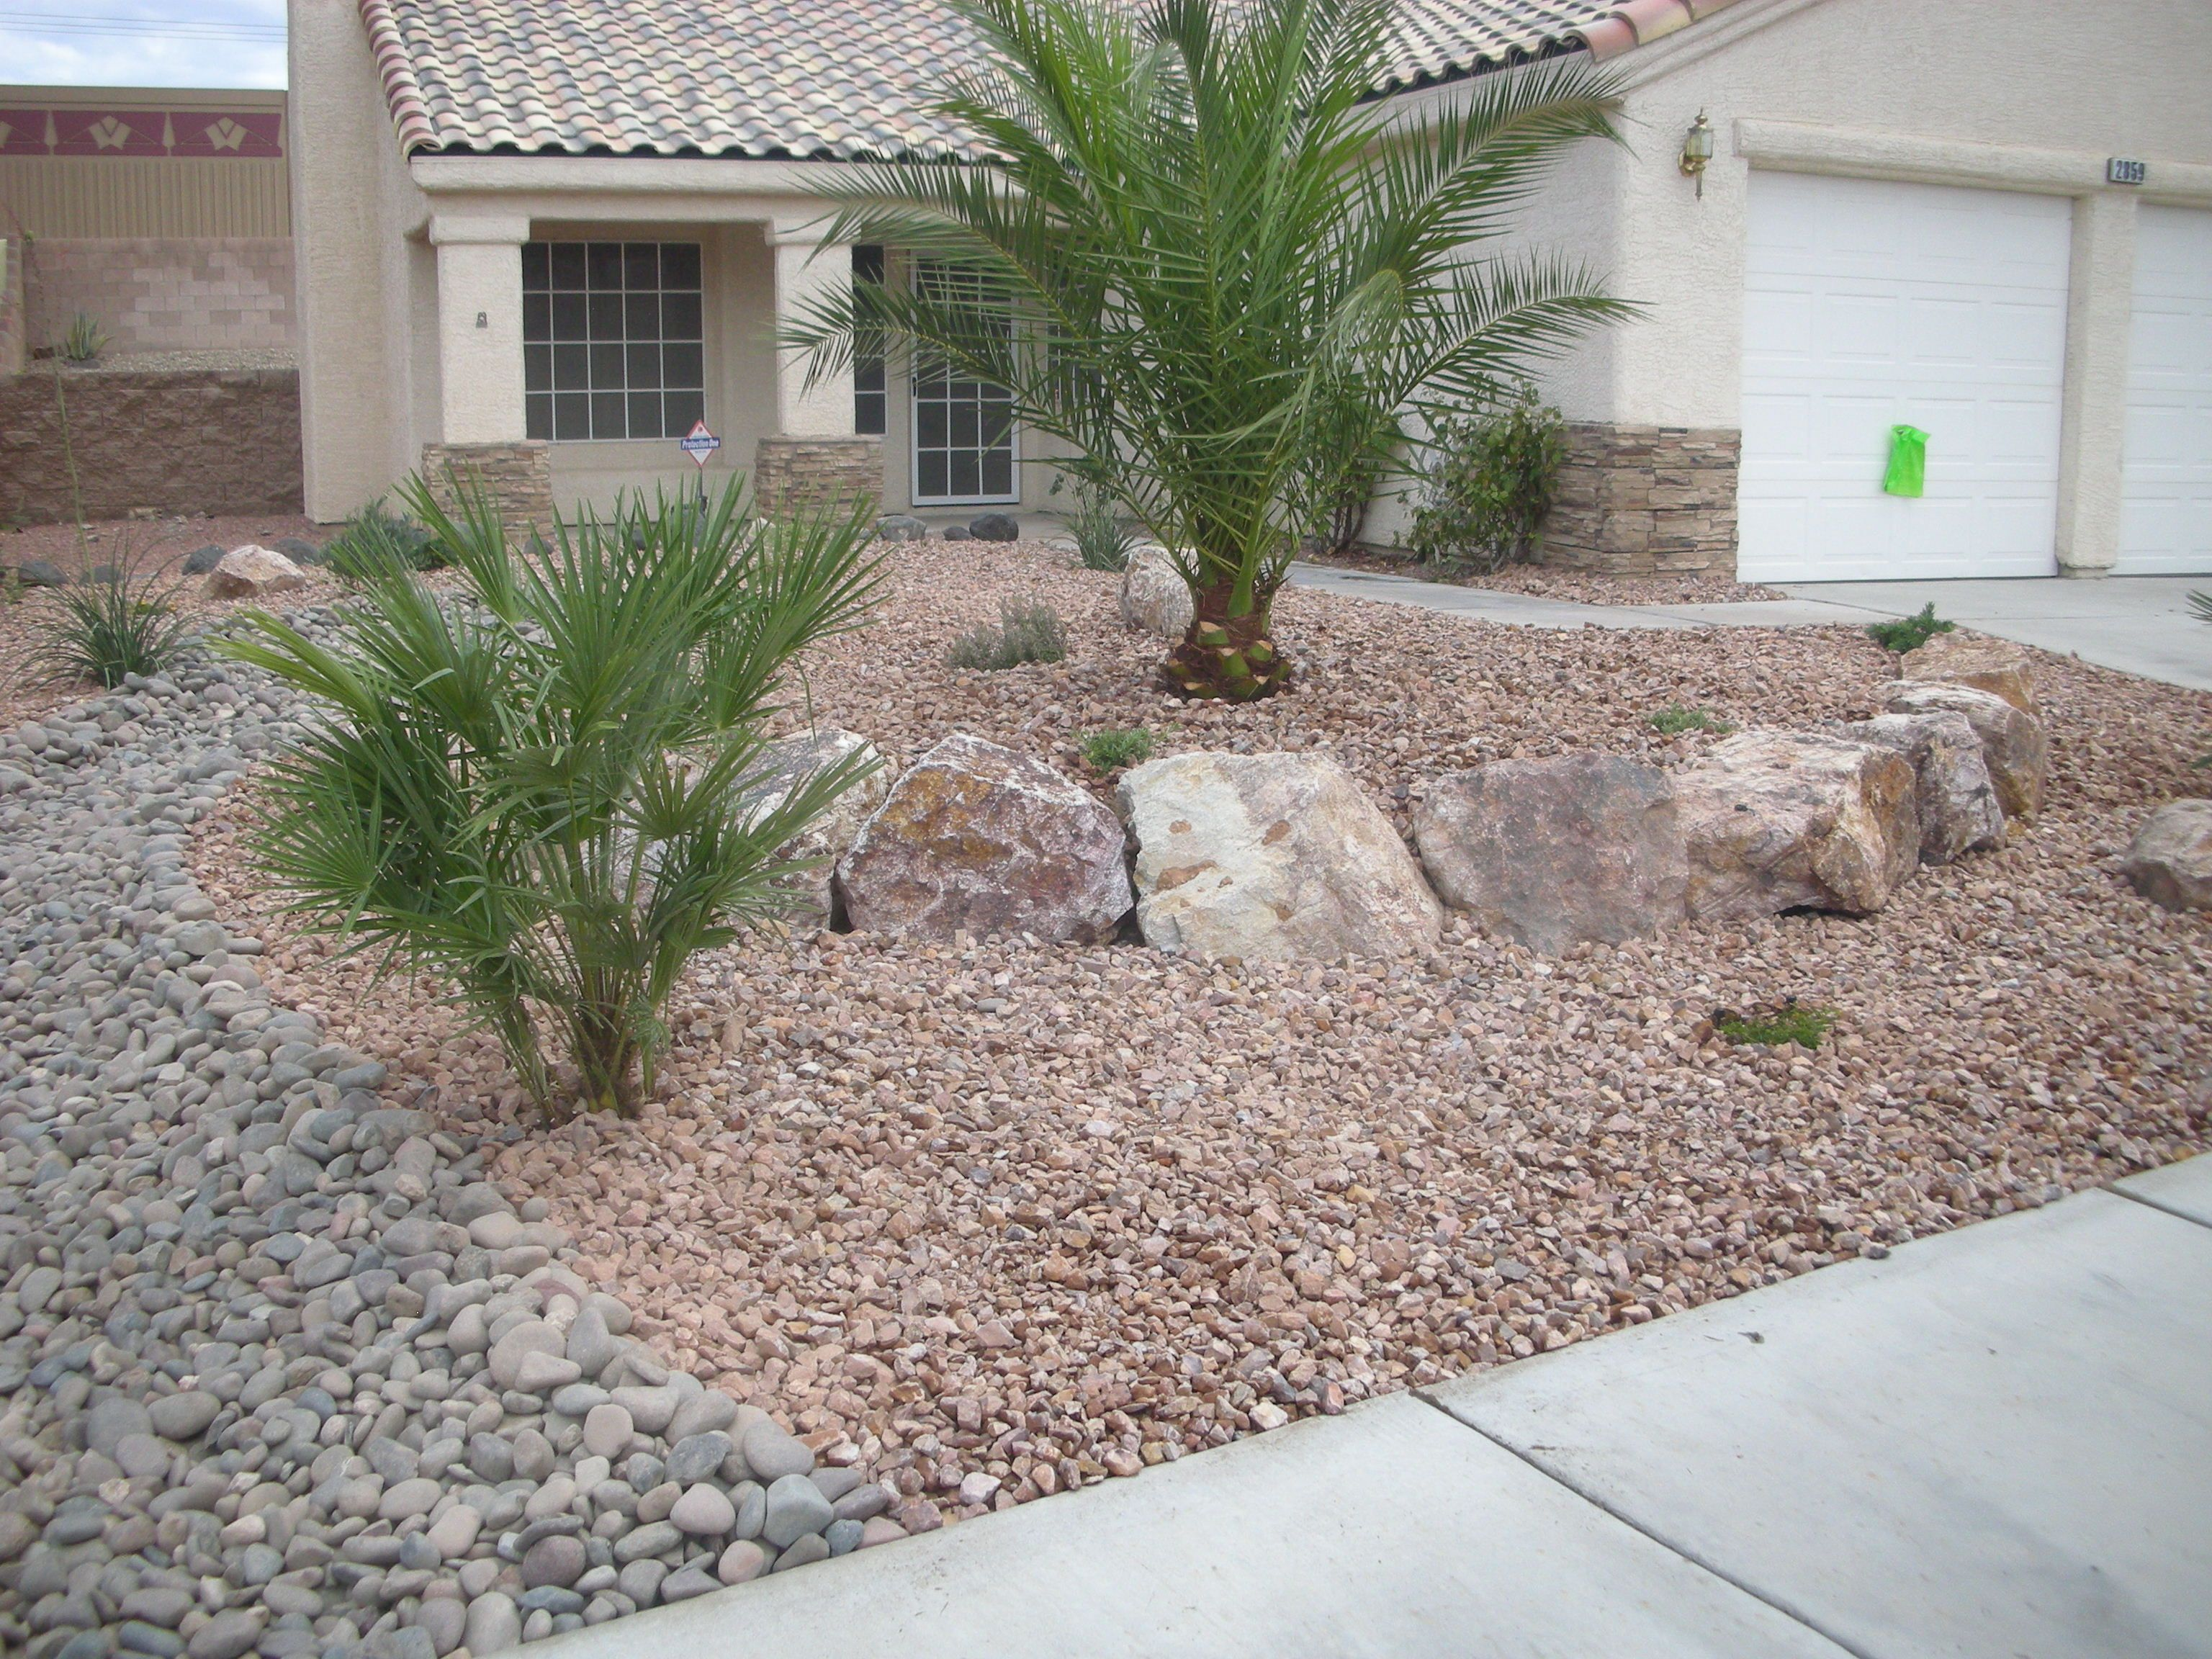 12 Genius Initiatives Of How To Improve Backyard Landscaping Las Vegas Backyard Landscaping Modern Landscaping Arizona Backyard